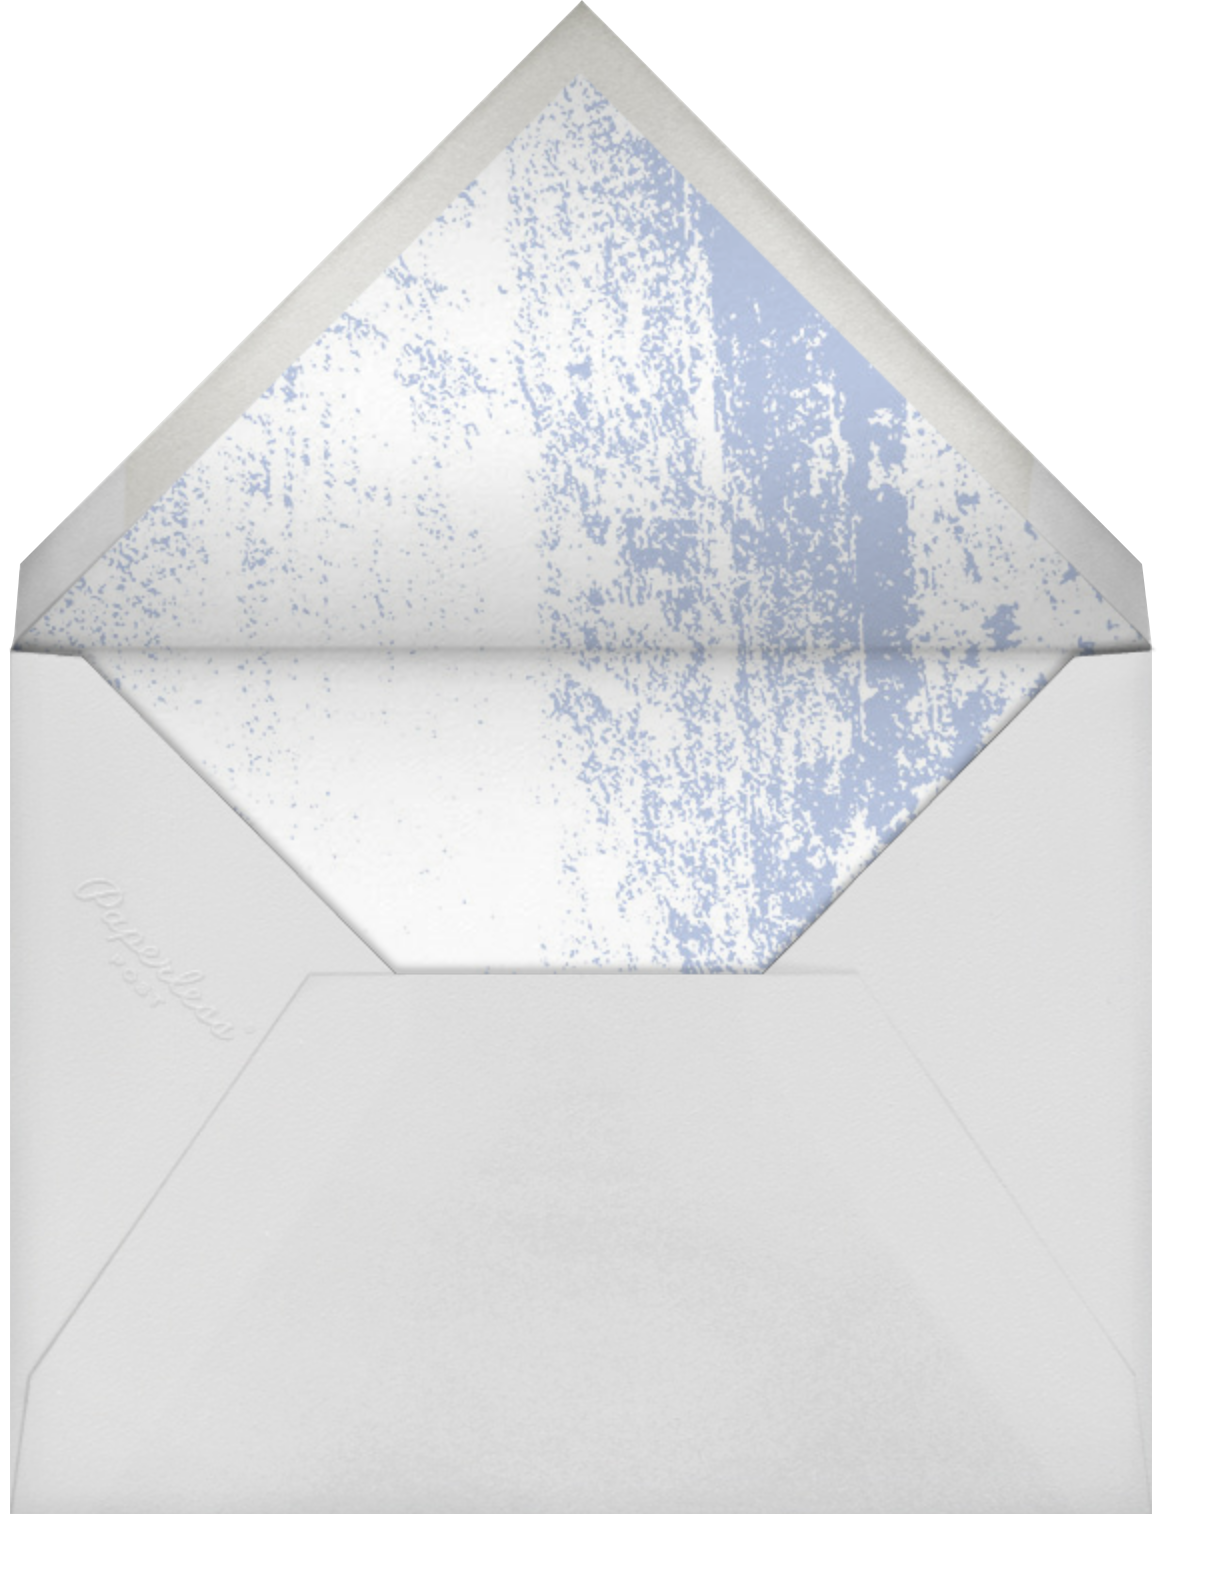 Aglow (Invitation) - Kelly Wearstler - All - envelope back